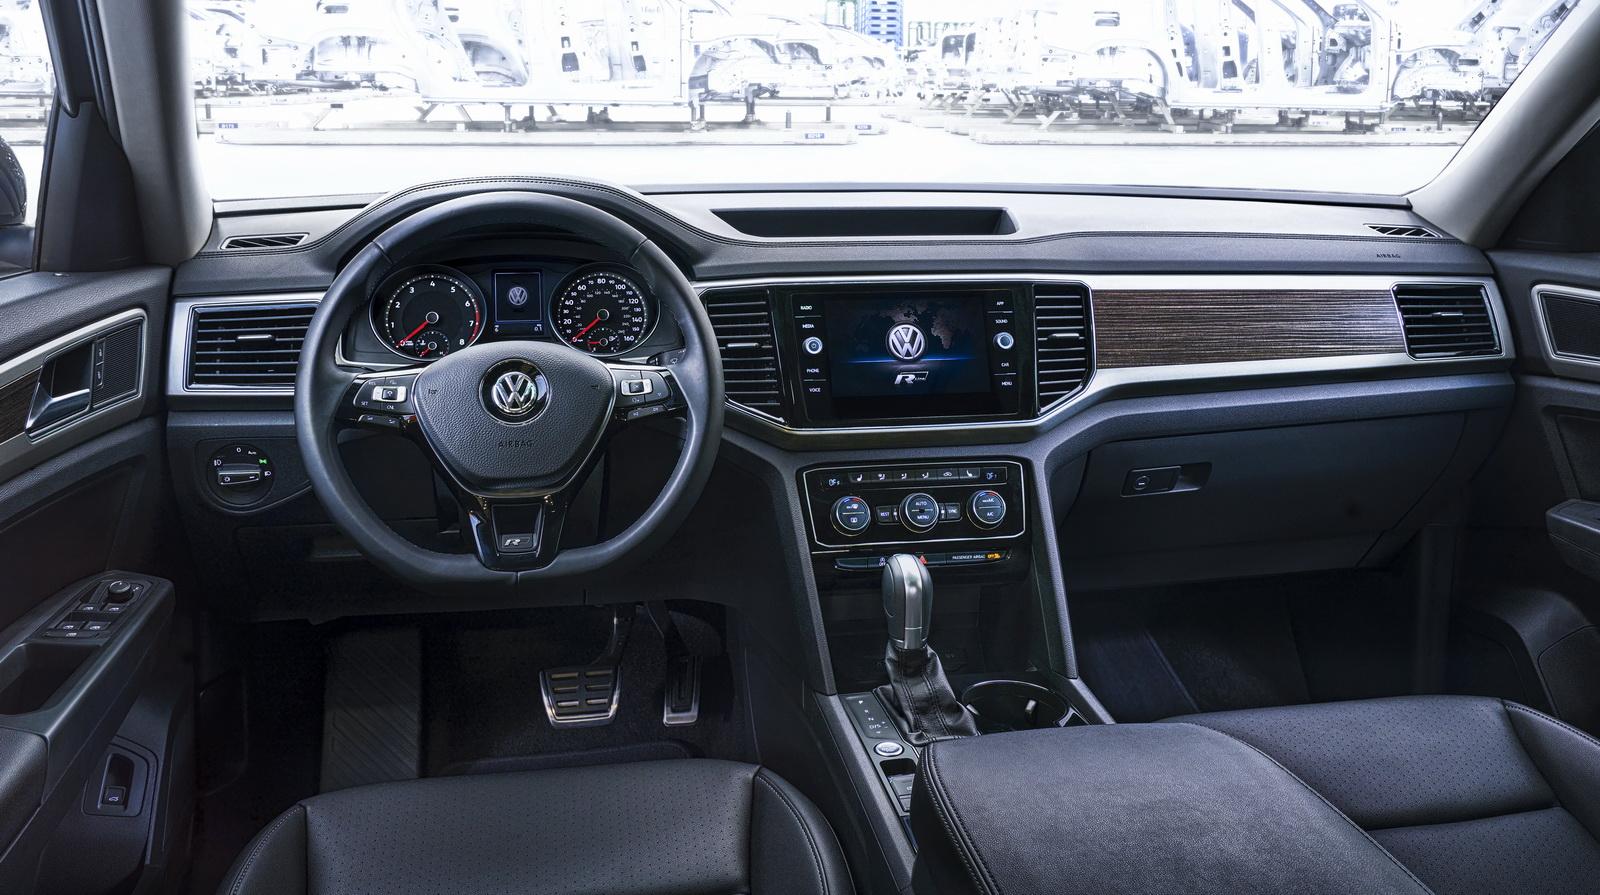 2017 - [Volkswagen] Atlas / Teramont - Page 8 VW-Atlas-RLine-14